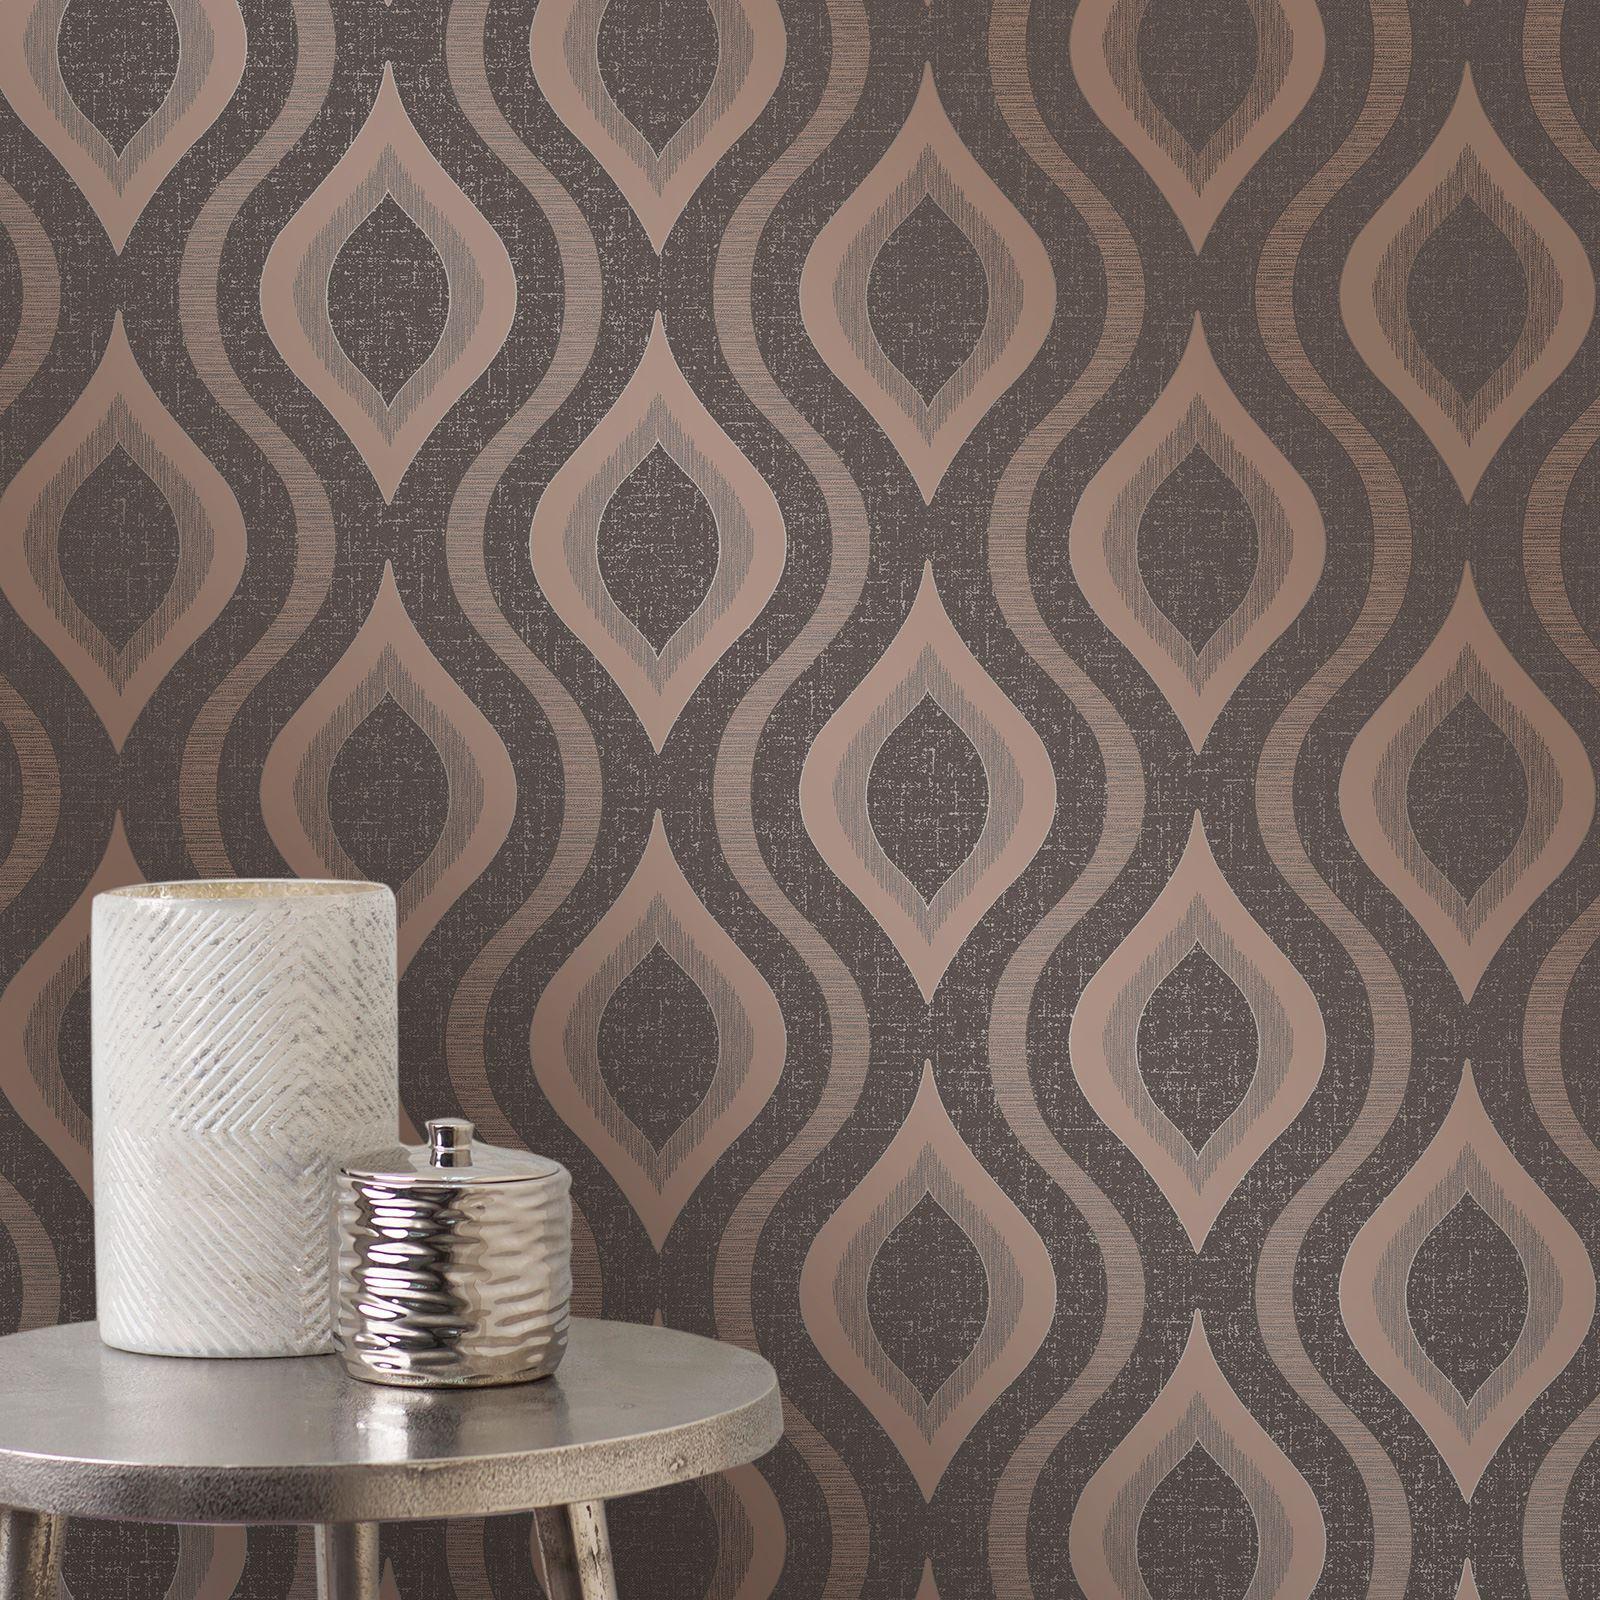 Newcastle United Bedroom Wallpaper Bedroom Decor Dark Wood Creative Apartment Bedroom Quirky Bedroom Furniture: FINE DECOR QUARTZ GEOMETRIC WALLPAPER ROSE GOLD SILVER